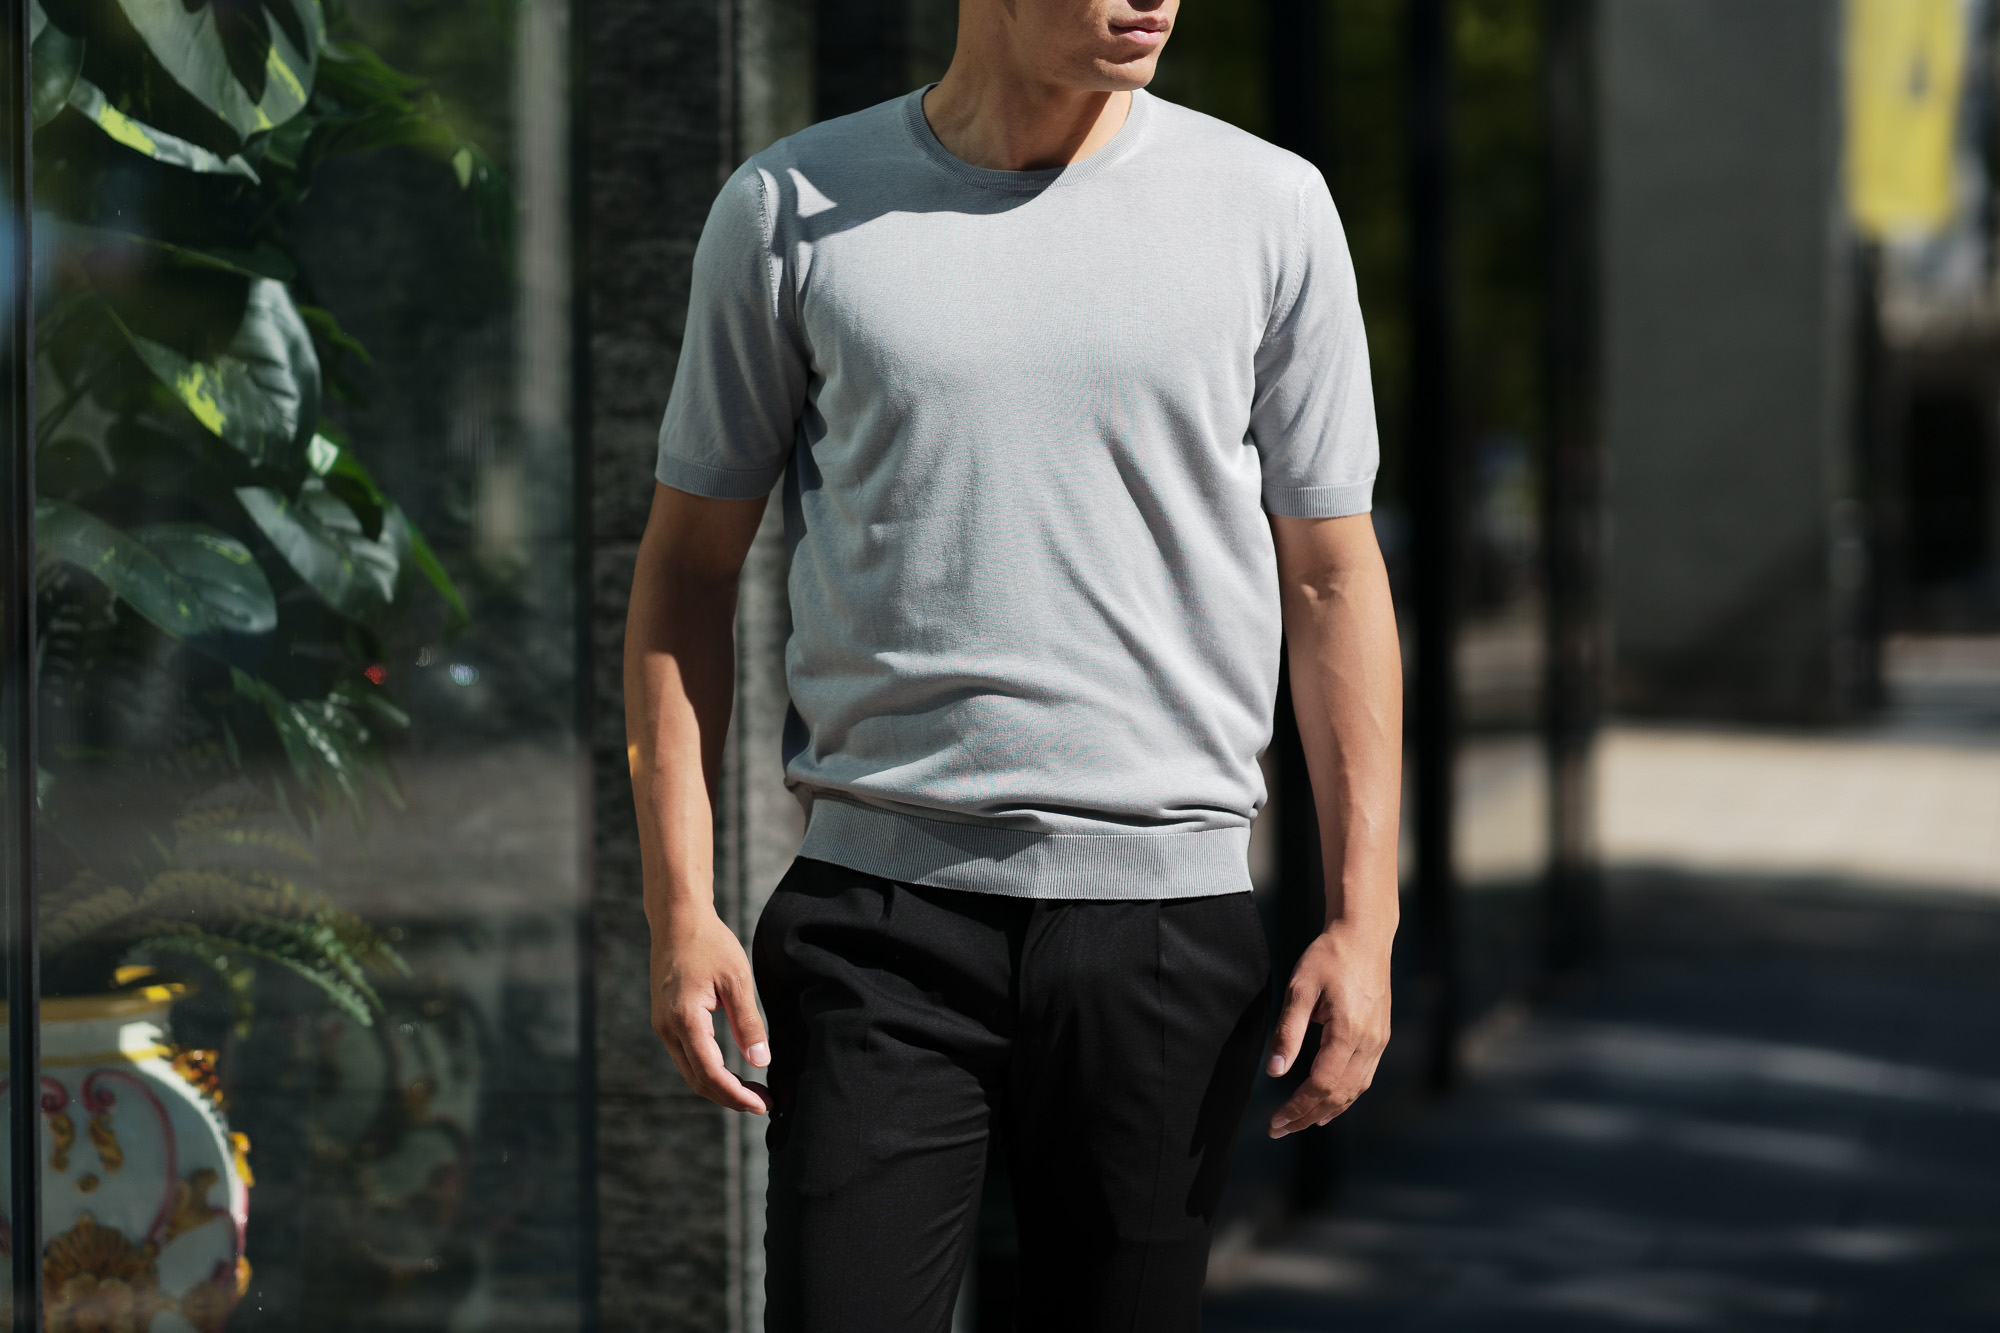 Gran Sasso (グランサッソ) Silk Knit T-shirt (シルクニット) SETA (シルク 100%) ショートスリーブ シルク ニット Tシャツ GREY (グレー・056) made in italy (イタリア製) 2019 春夏新作 gransasso 愛知 名古屋 altoediritto アルトエデリット